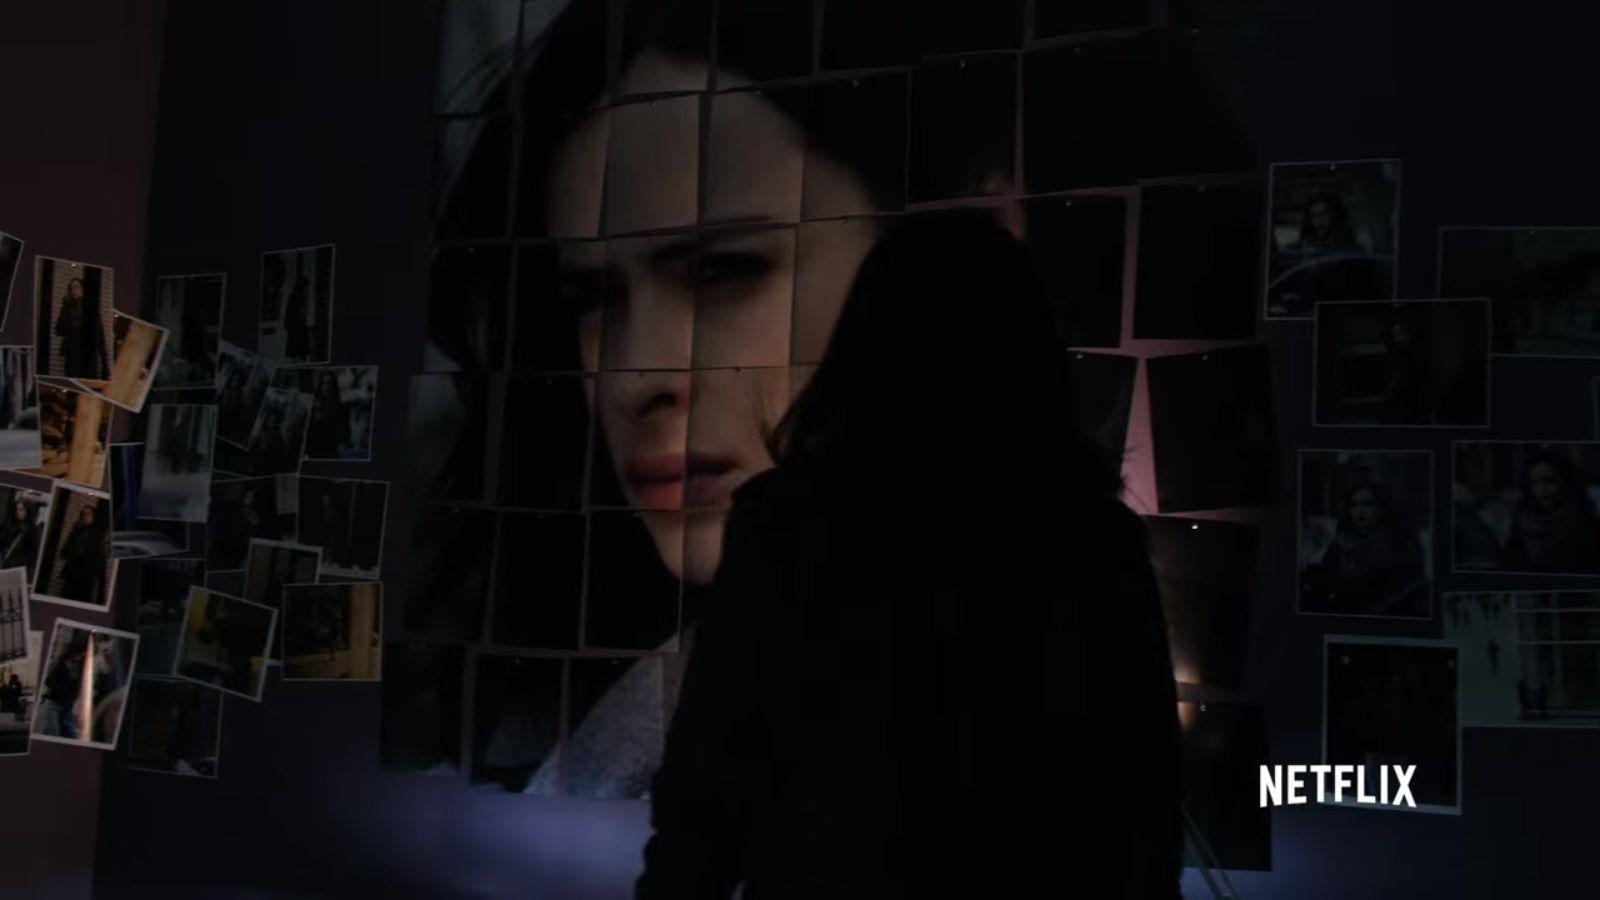 Full Jessica Jones Trailer Emphasizes the Creepy | The Robot's Voice